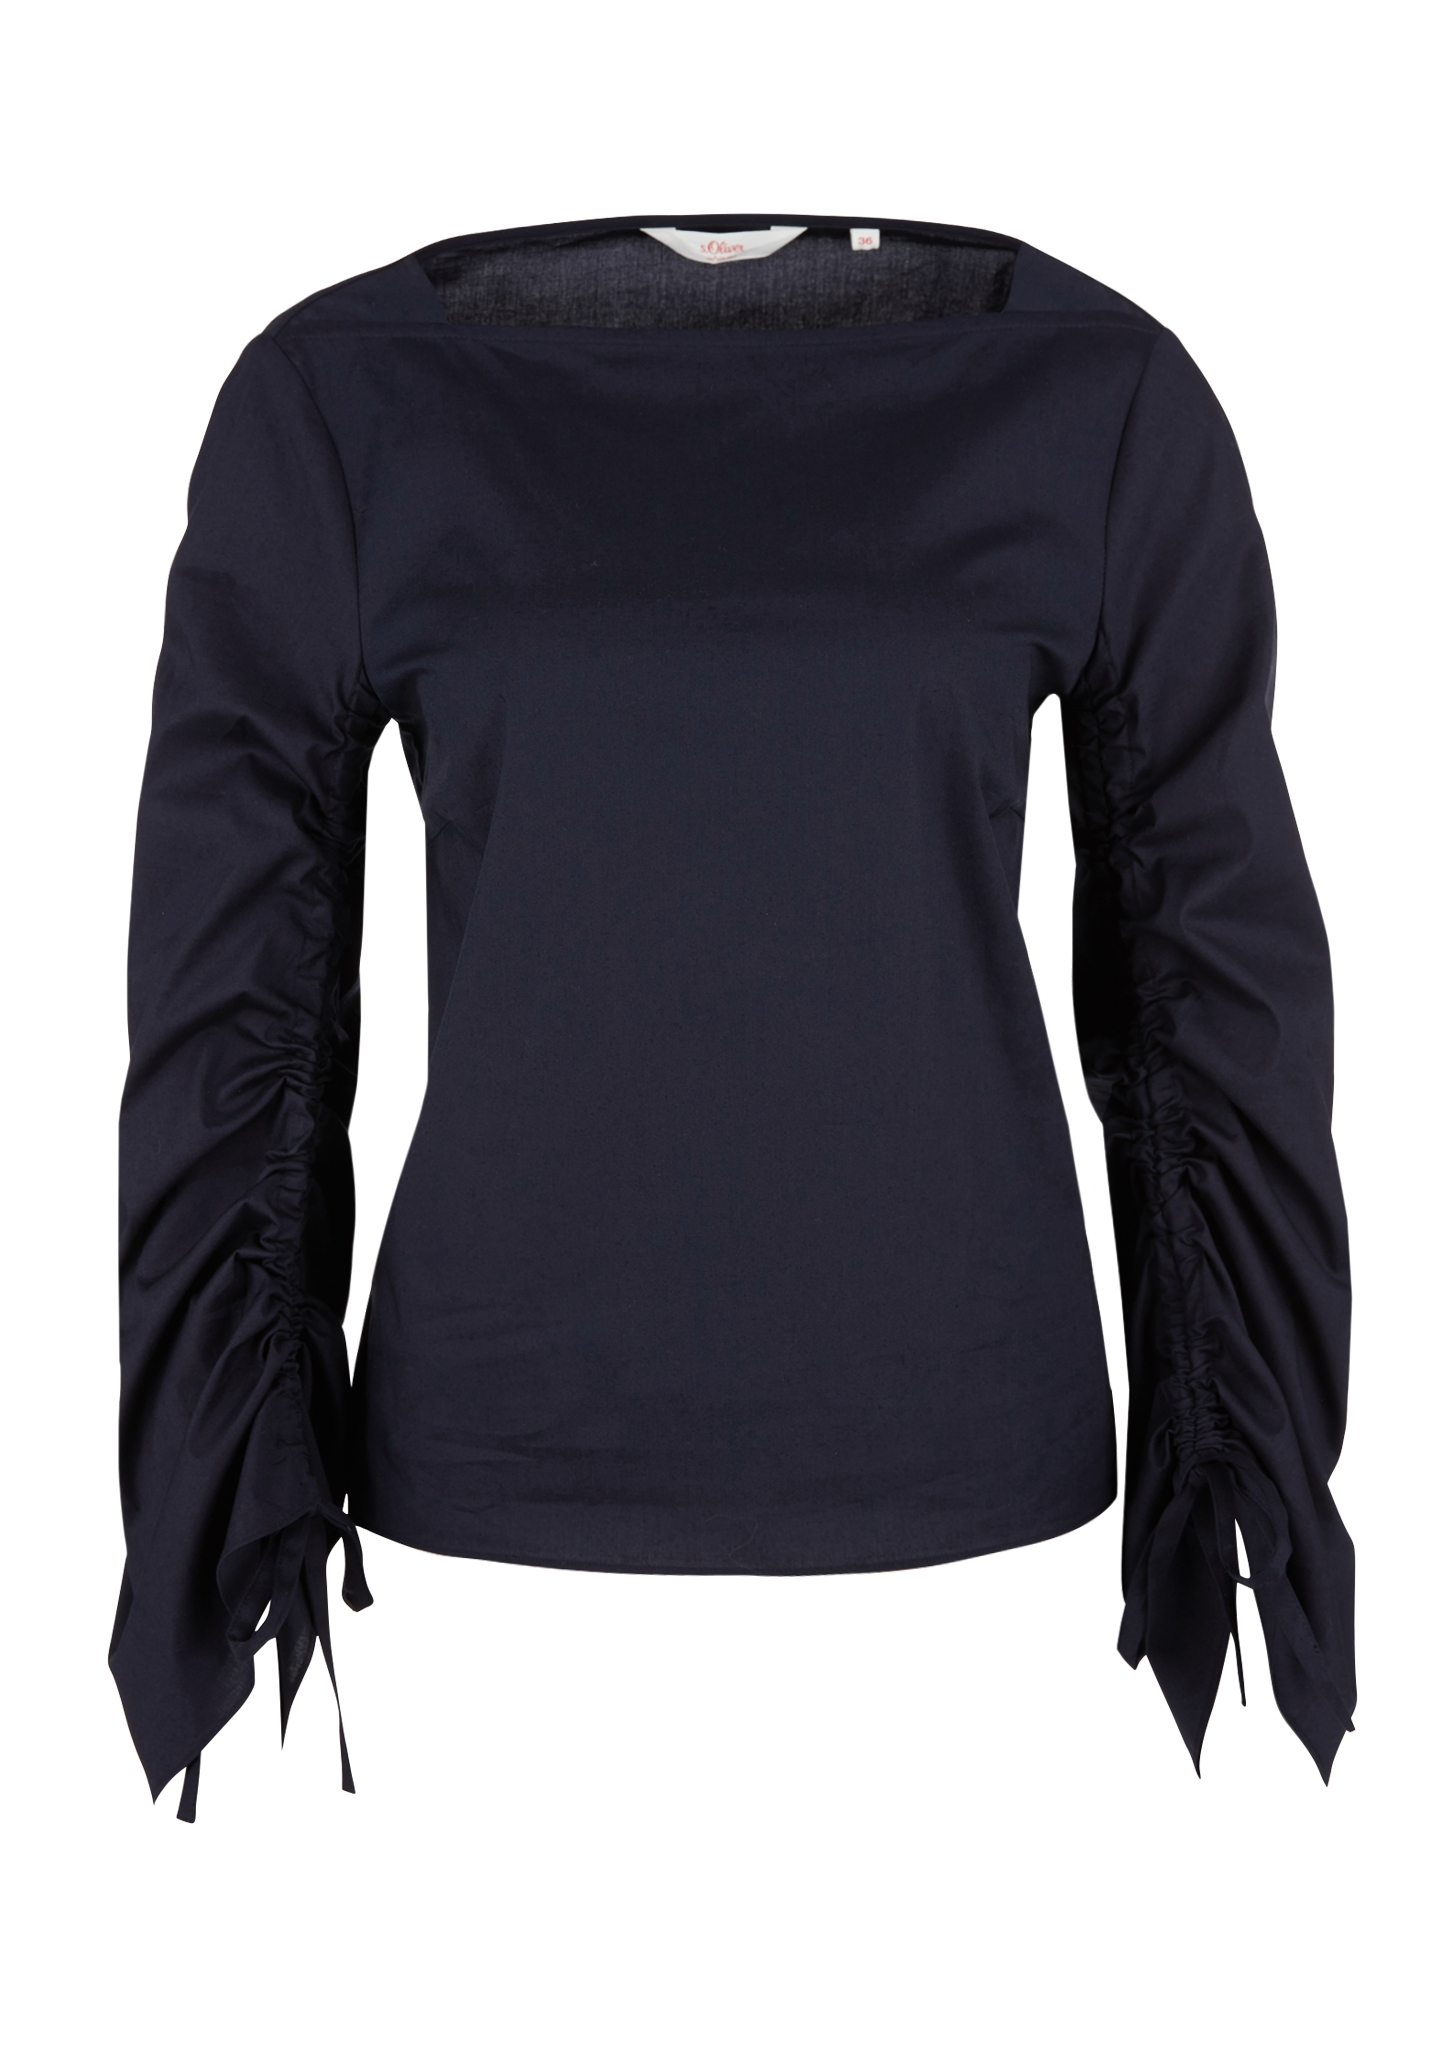 Blusenshirt | Bekleidung > Shirts > Blusenshirts | s.Oliver